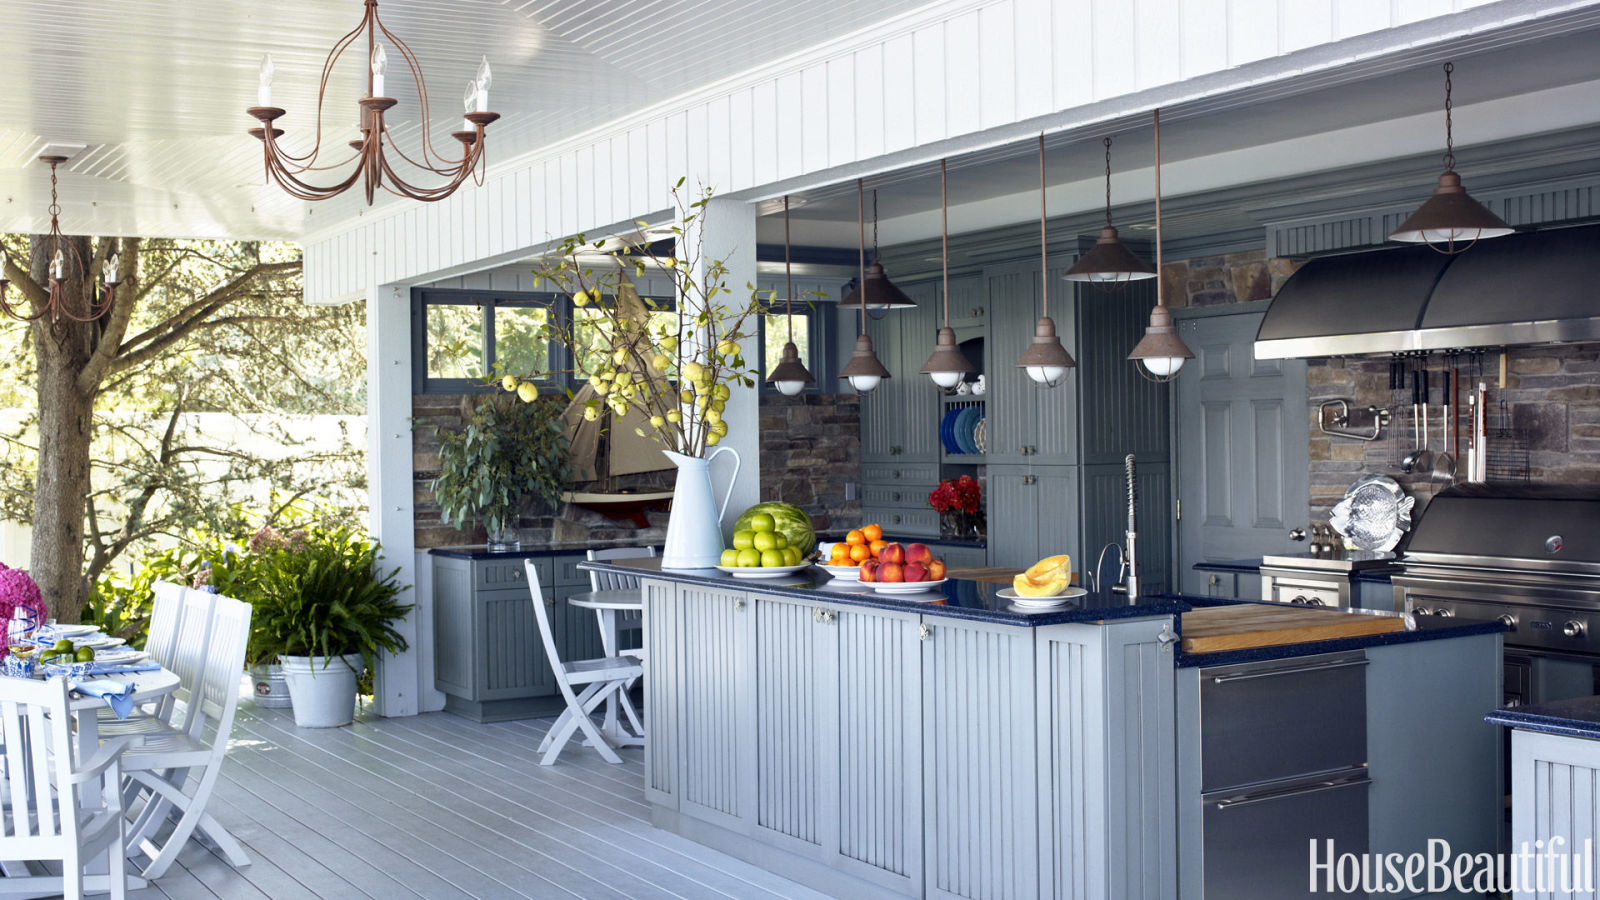 Outdoor kitchen design photo gallery - Outdoor Kitchen Design Photo Gallery 28